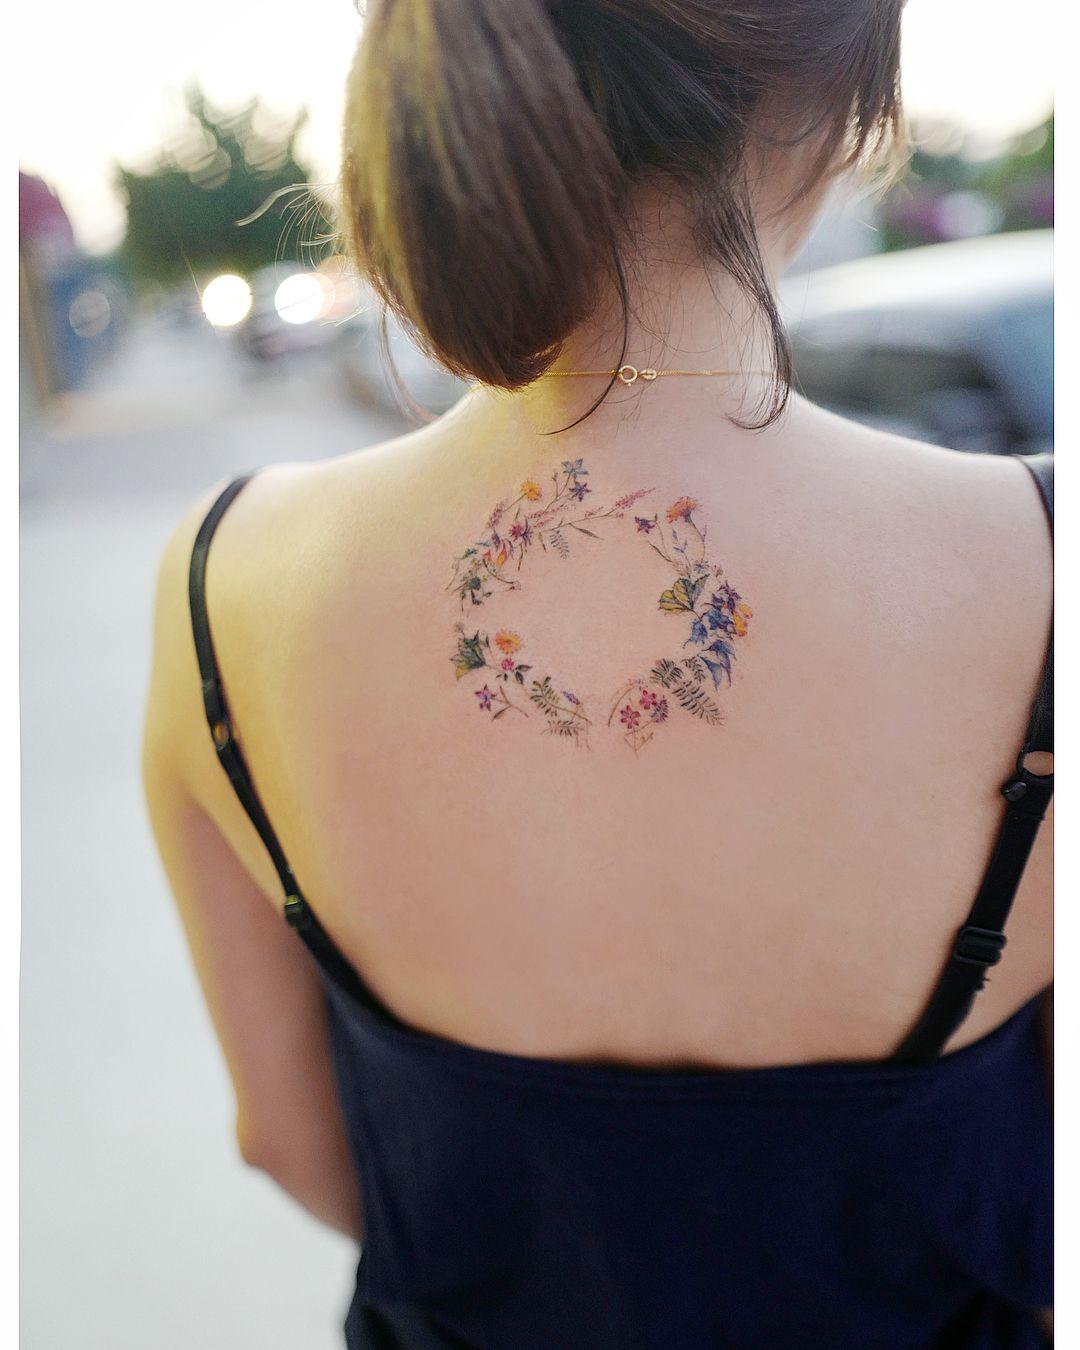 c1e758314 Click for 40 Tattoos That Highlight Femininity #tattoo #tattoos#tattoodesign  #tattooidea